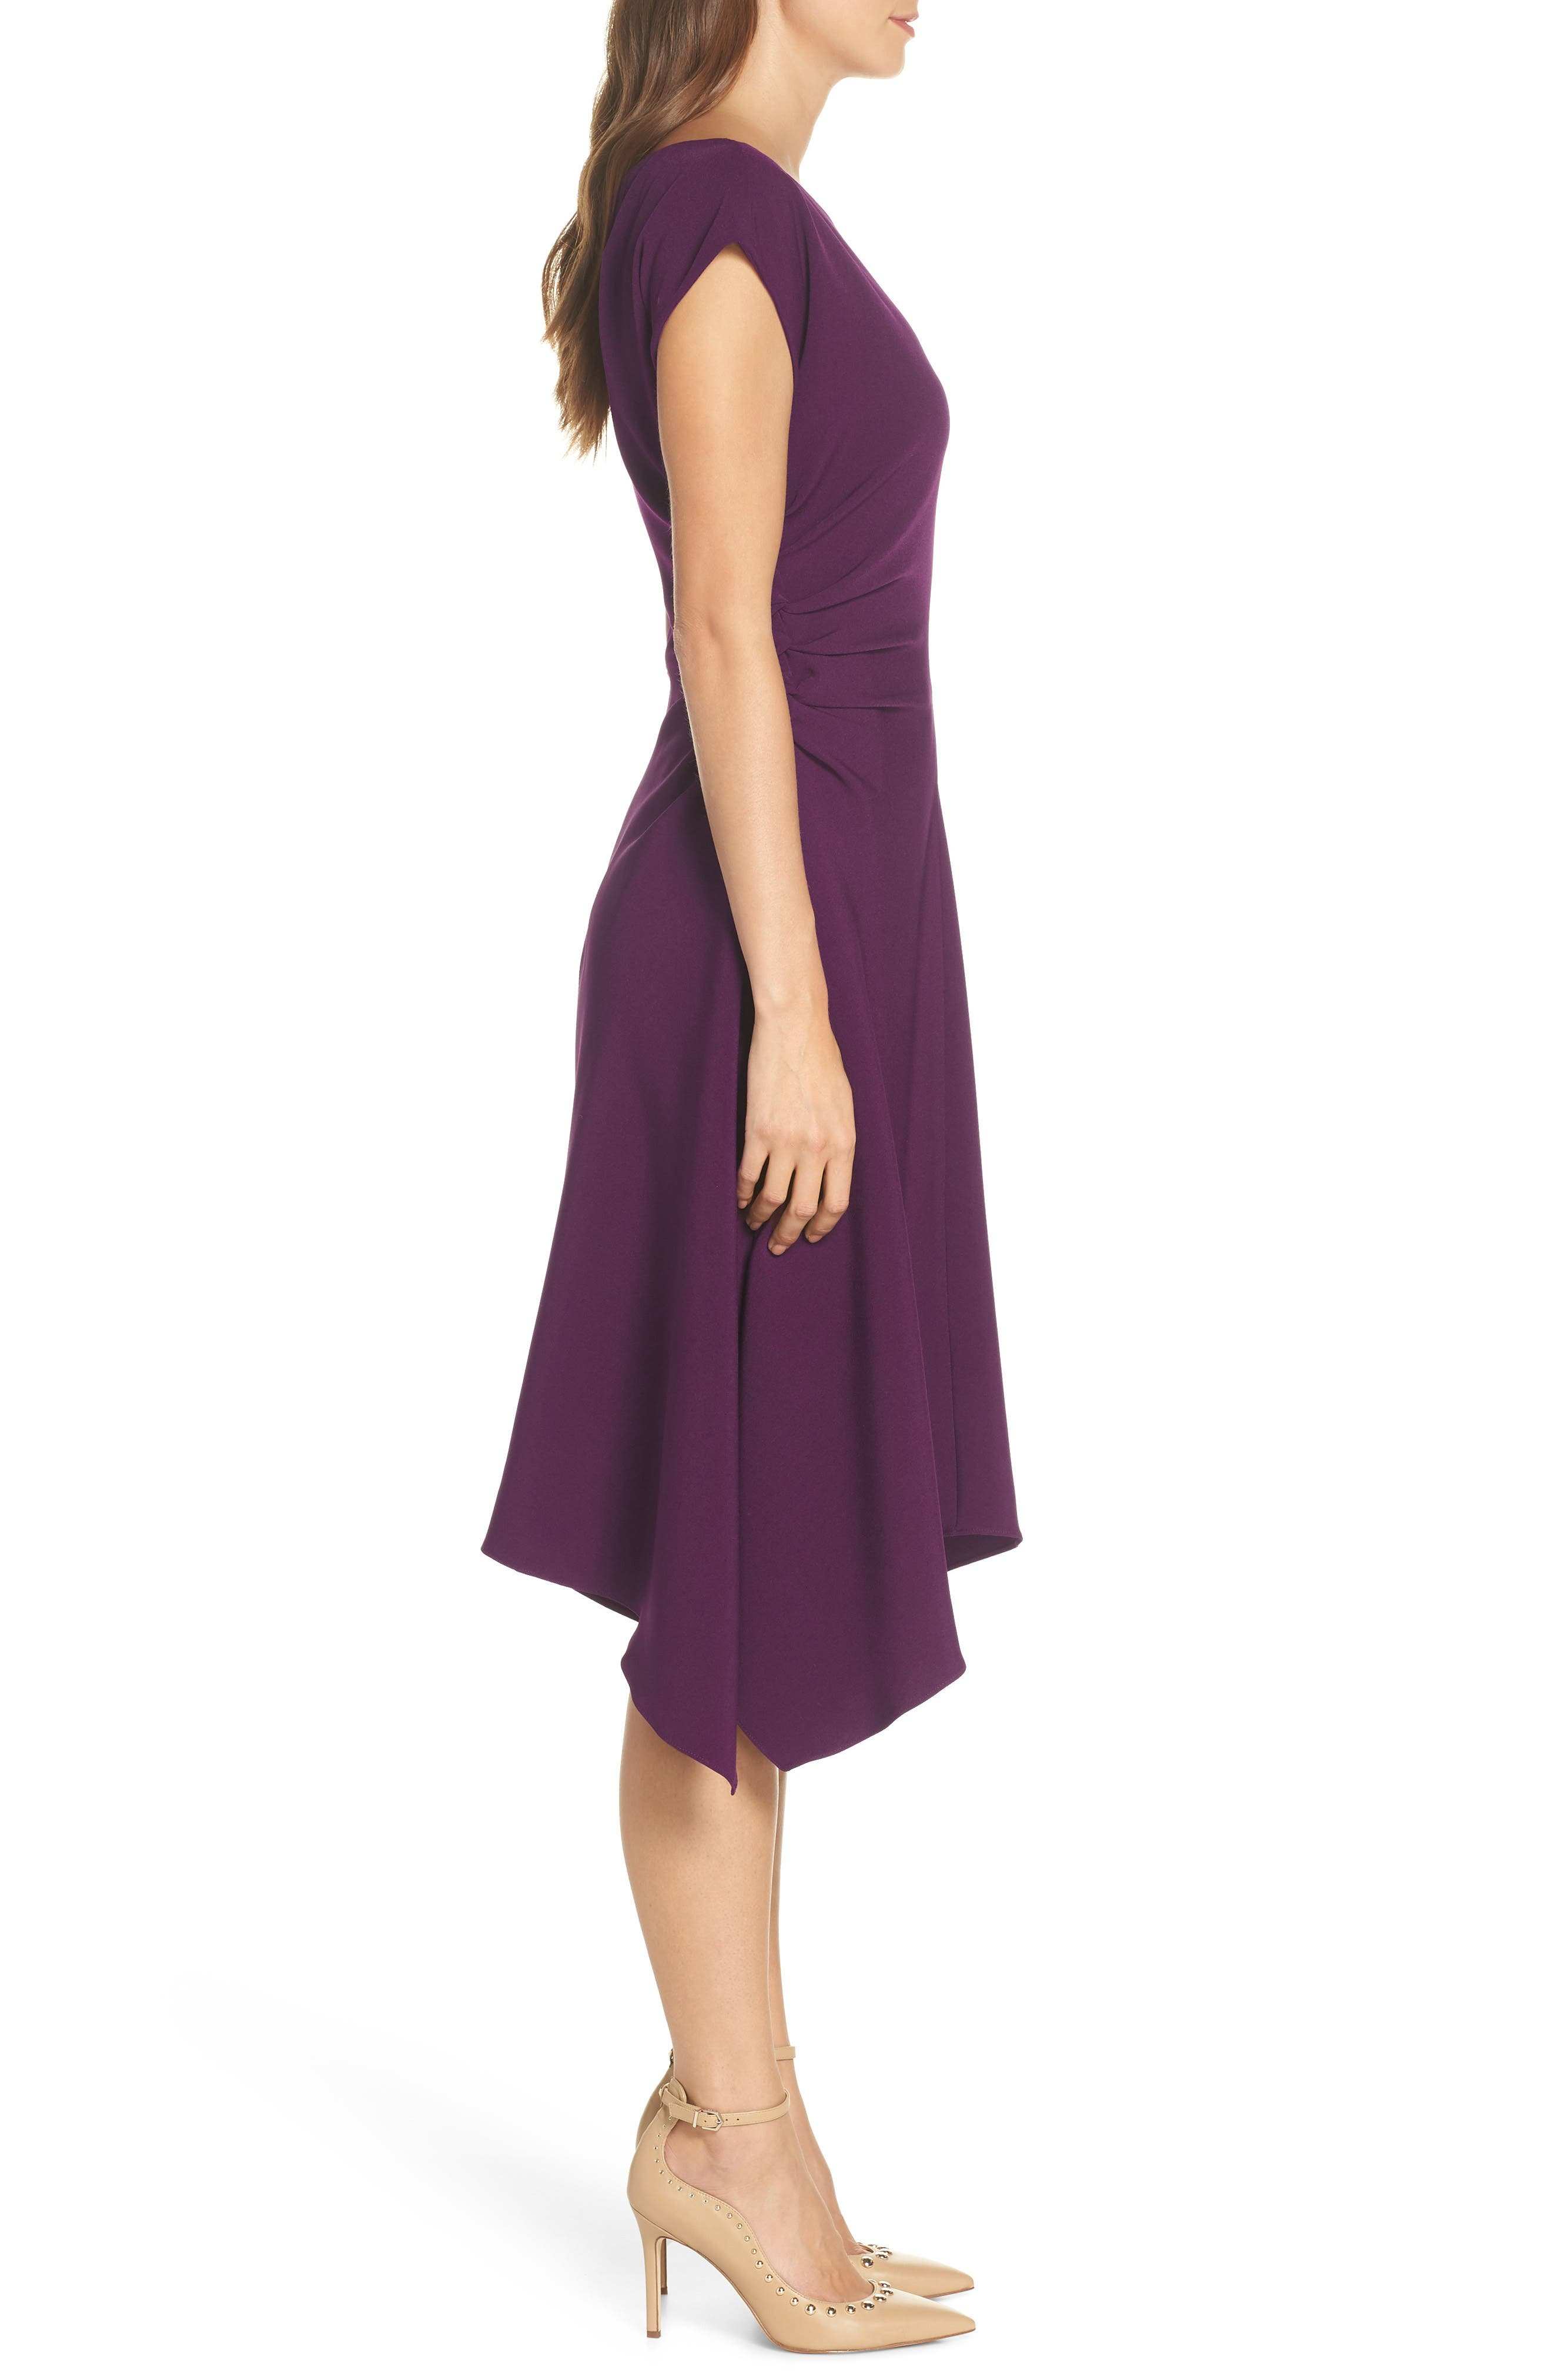 JULIA JORDAN,                             Ruched Stretch Crepe Fit & Flare Dress,                             Alternate thumbnail 3, color,                             PLUM